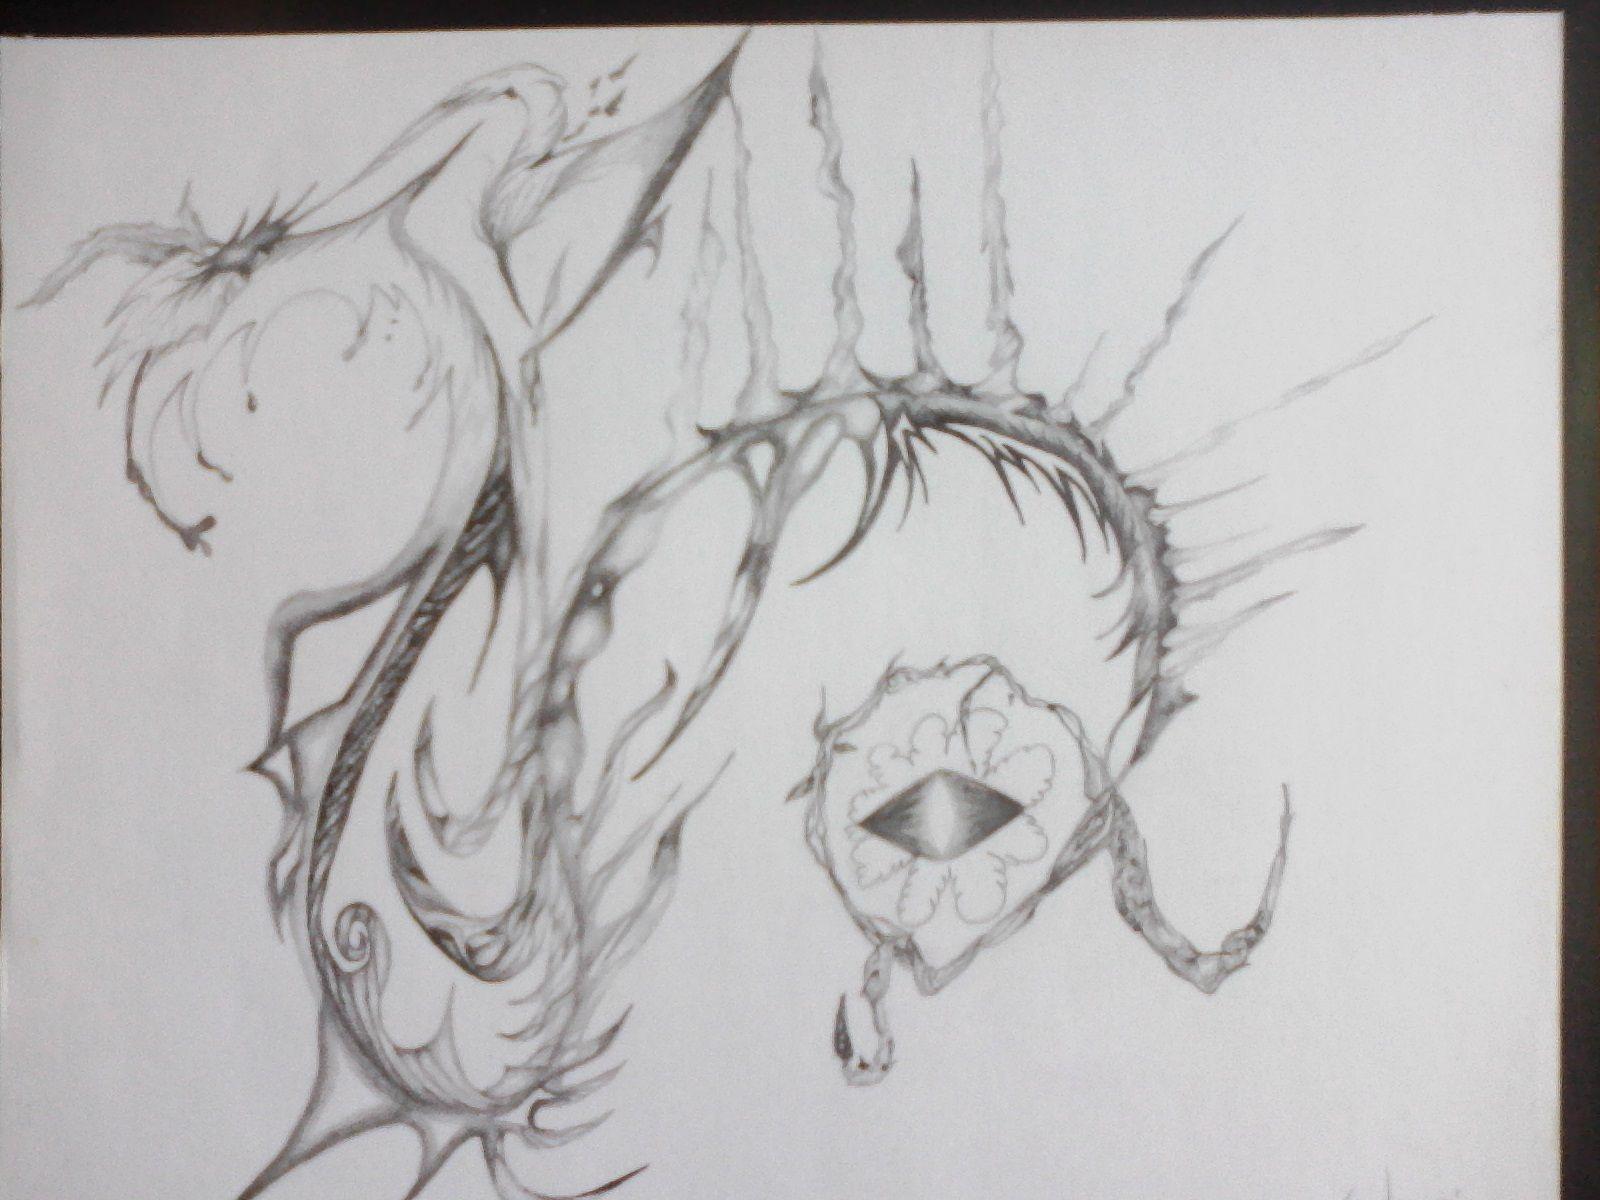 O o a k pencil graphite drawing eye of chaos